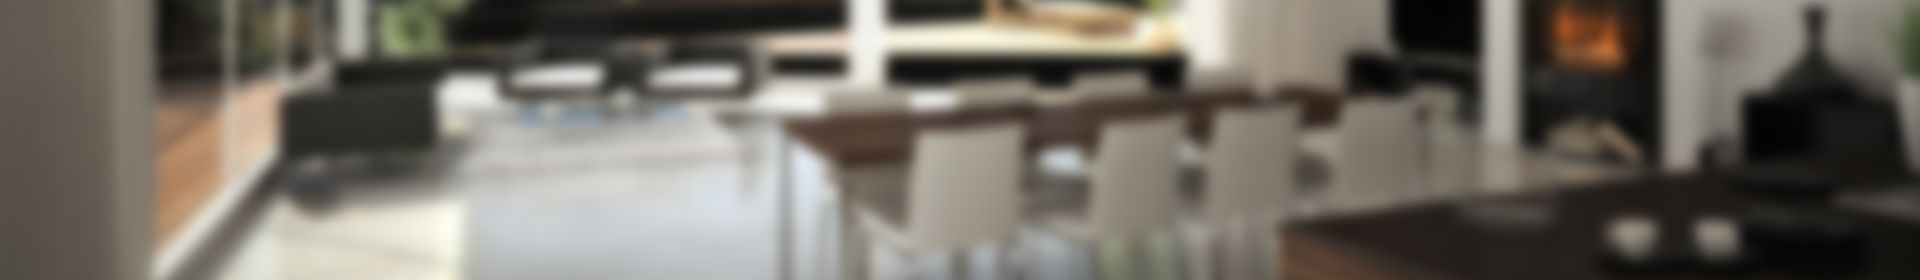 wohnungen provisionsfrei mieten srs immobilien gmbh graz. Black Bedroom Furniture Sets. Home Design Ideas